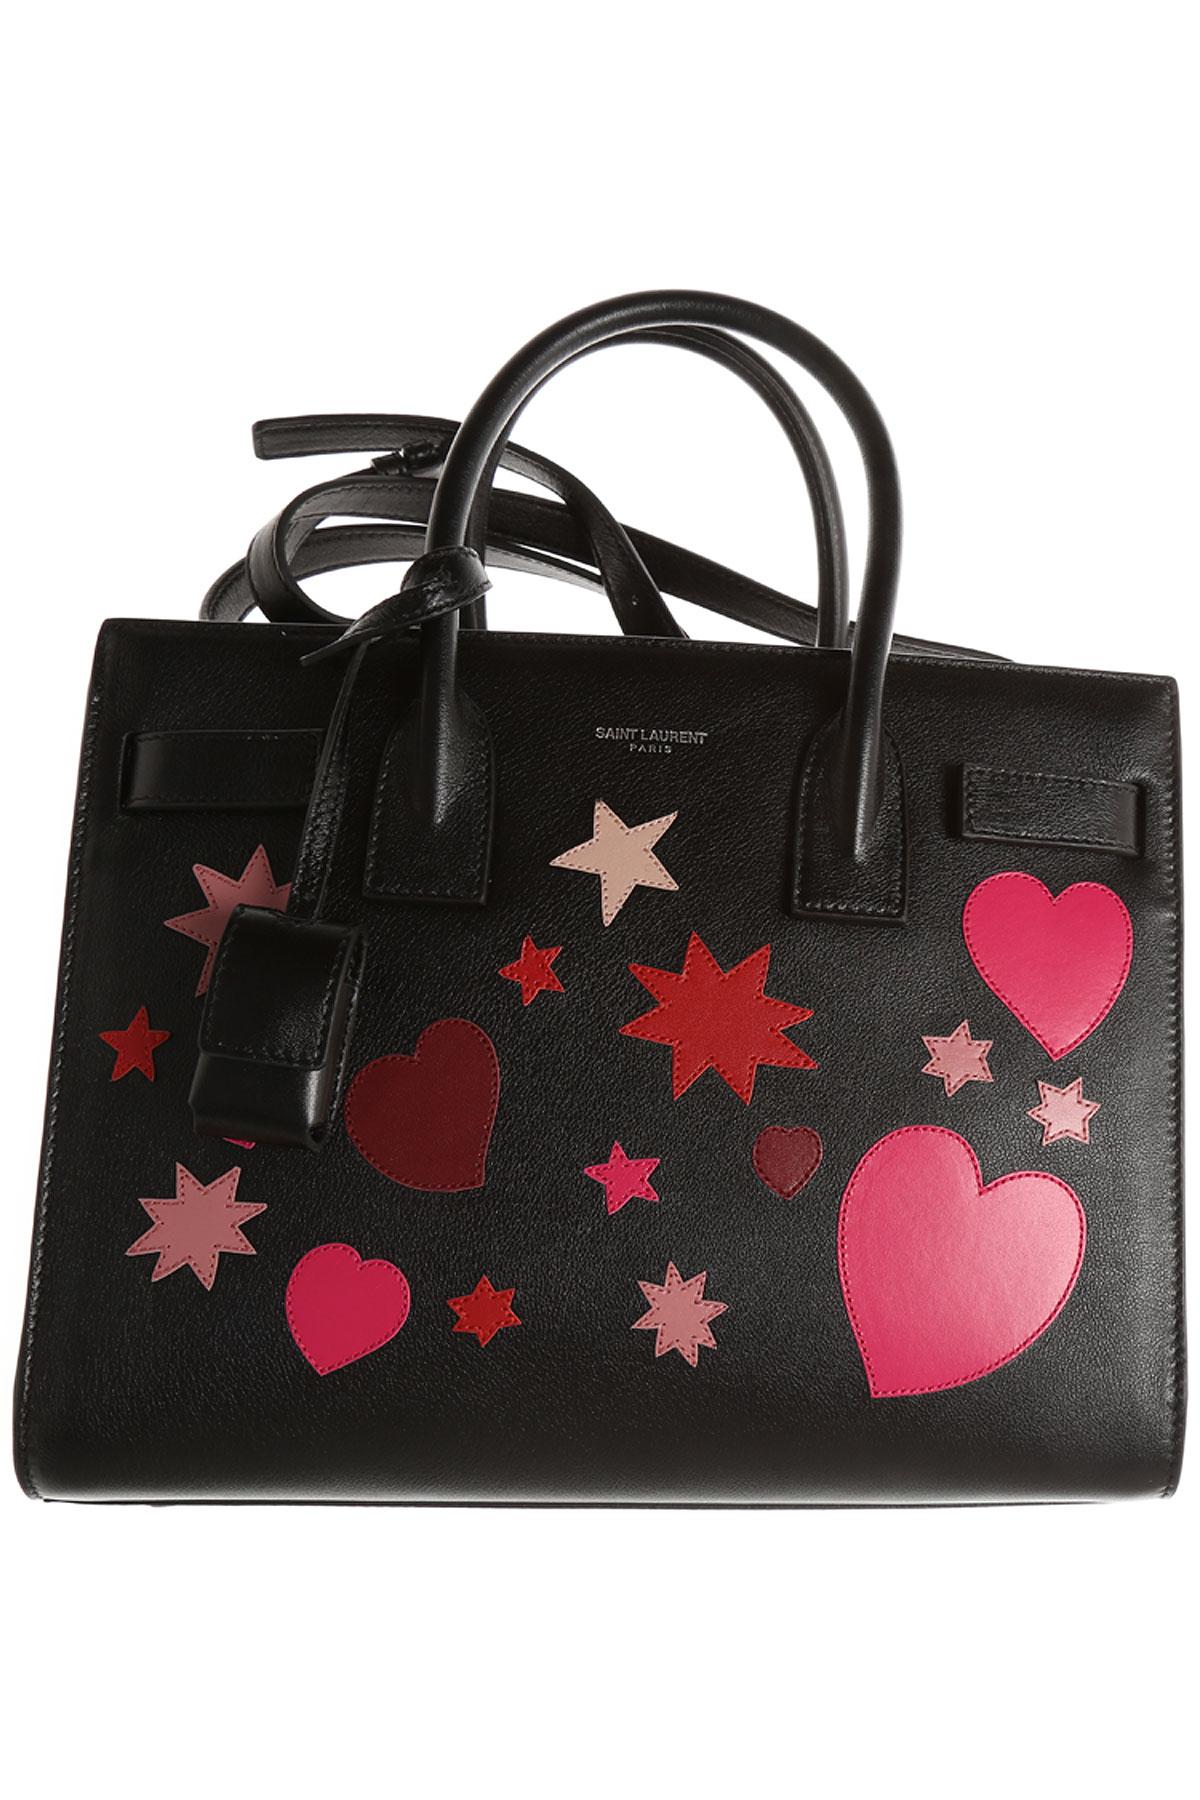 Yves Saint Laurent Handbags | Saint Laurent Low Top Sneakers | Ysl Chain Bag